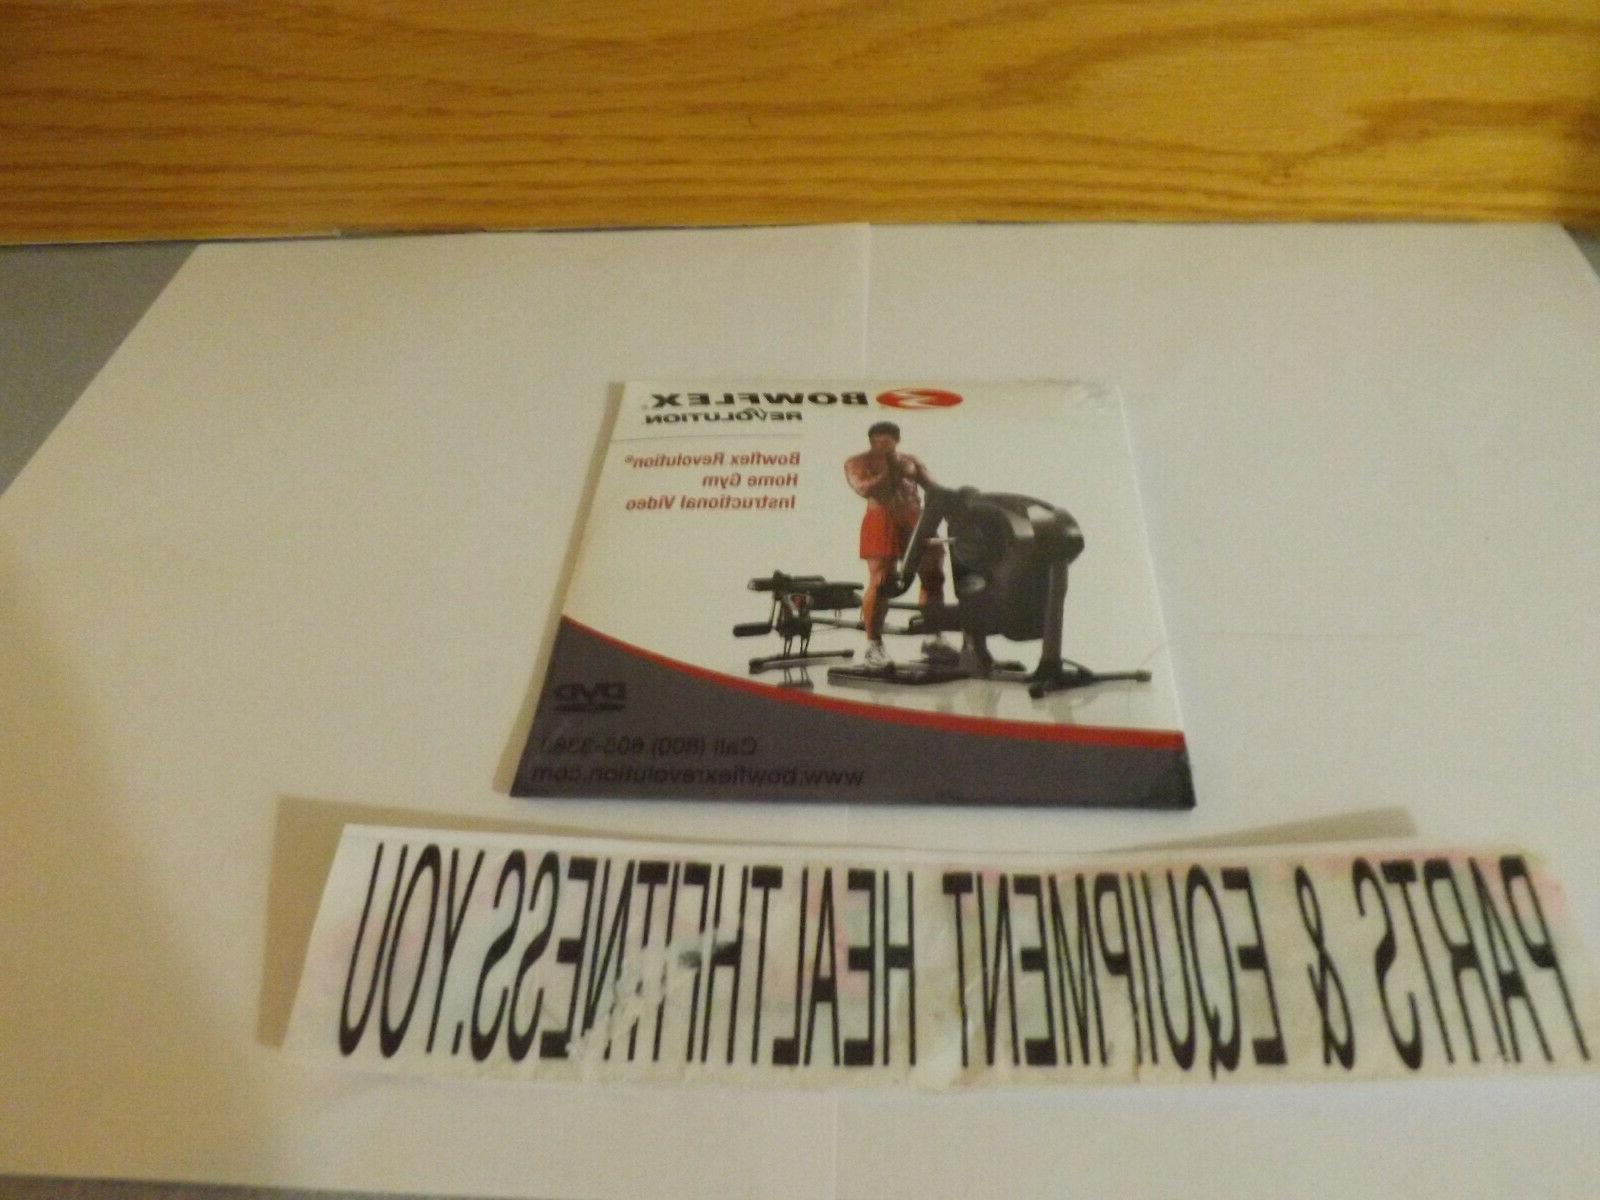 revolution home gym dvd brandnew sealed